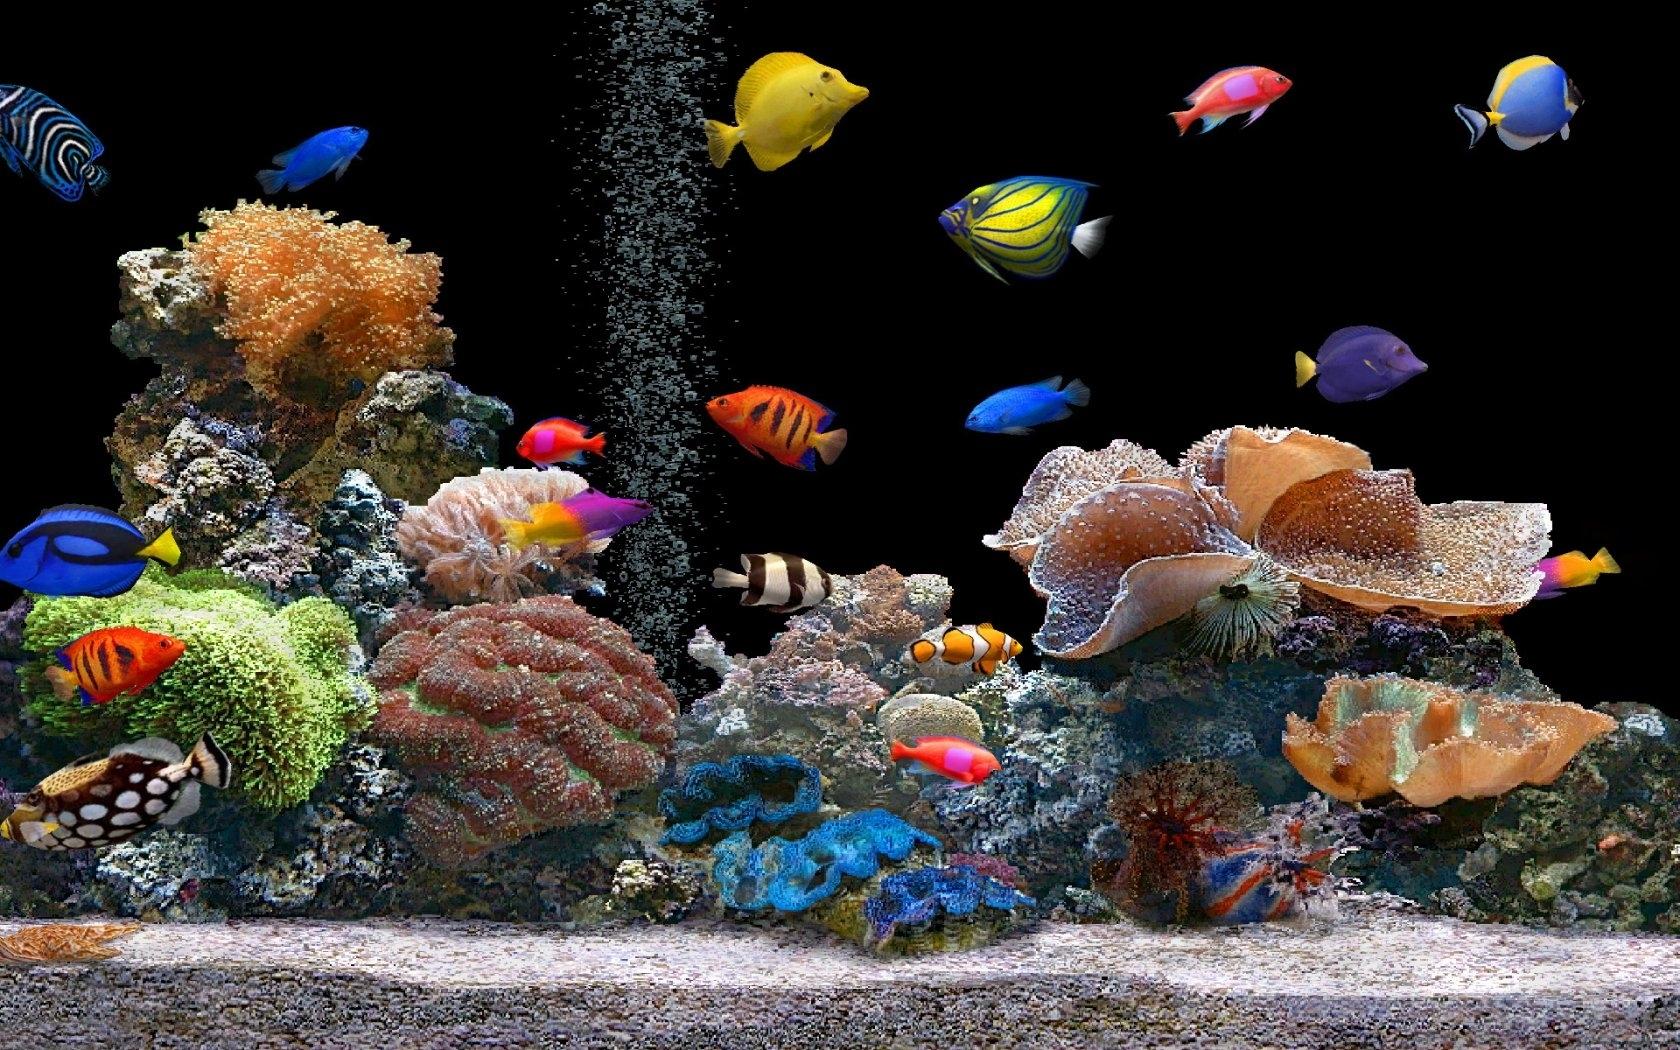 live fish tank desktop background wallpaper